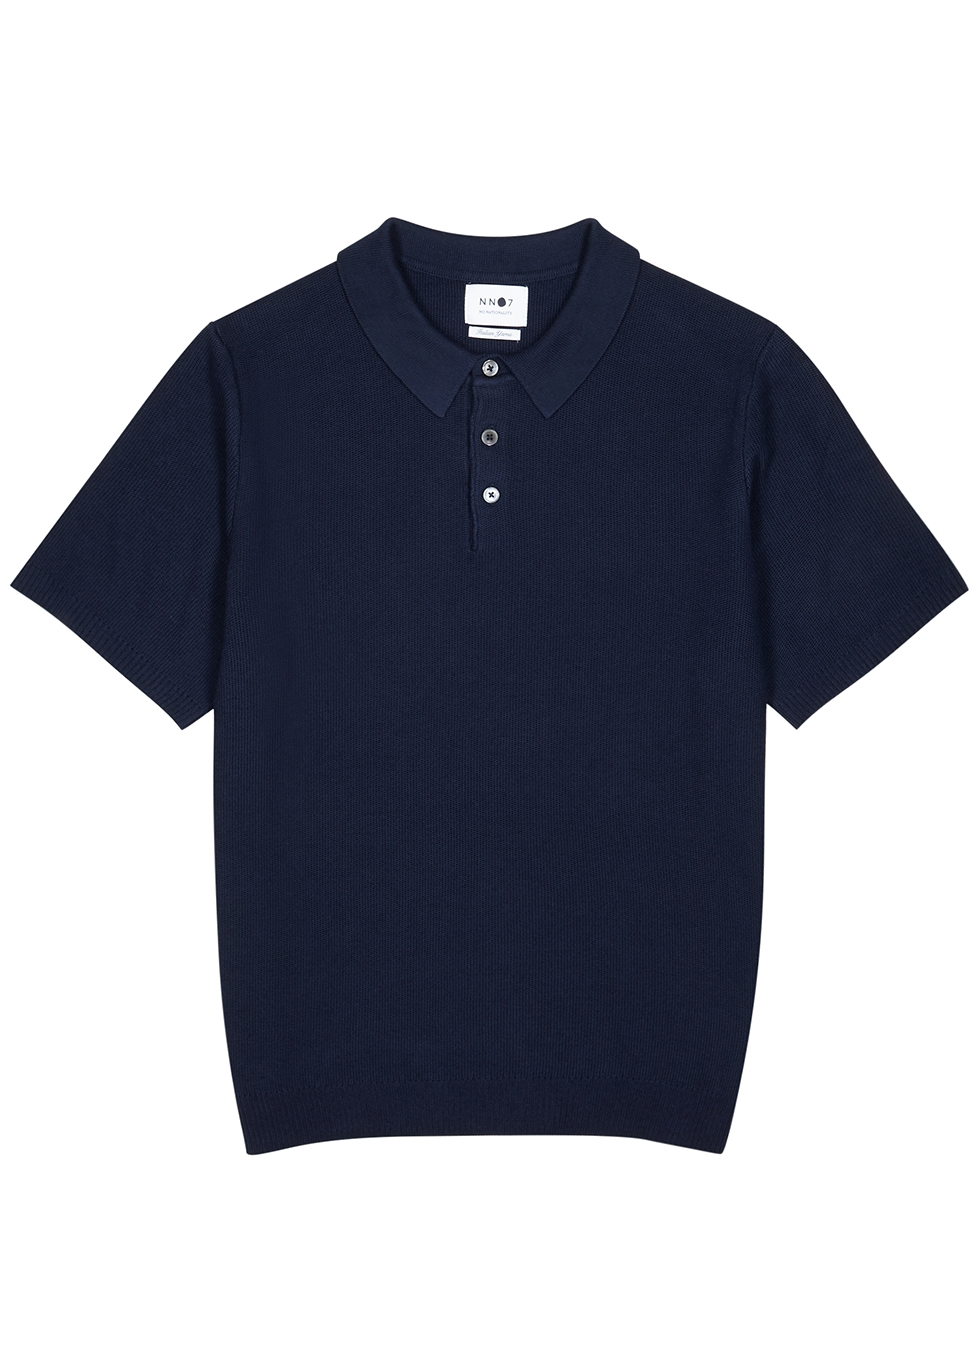 Alfie navy fine-knit polo shirt